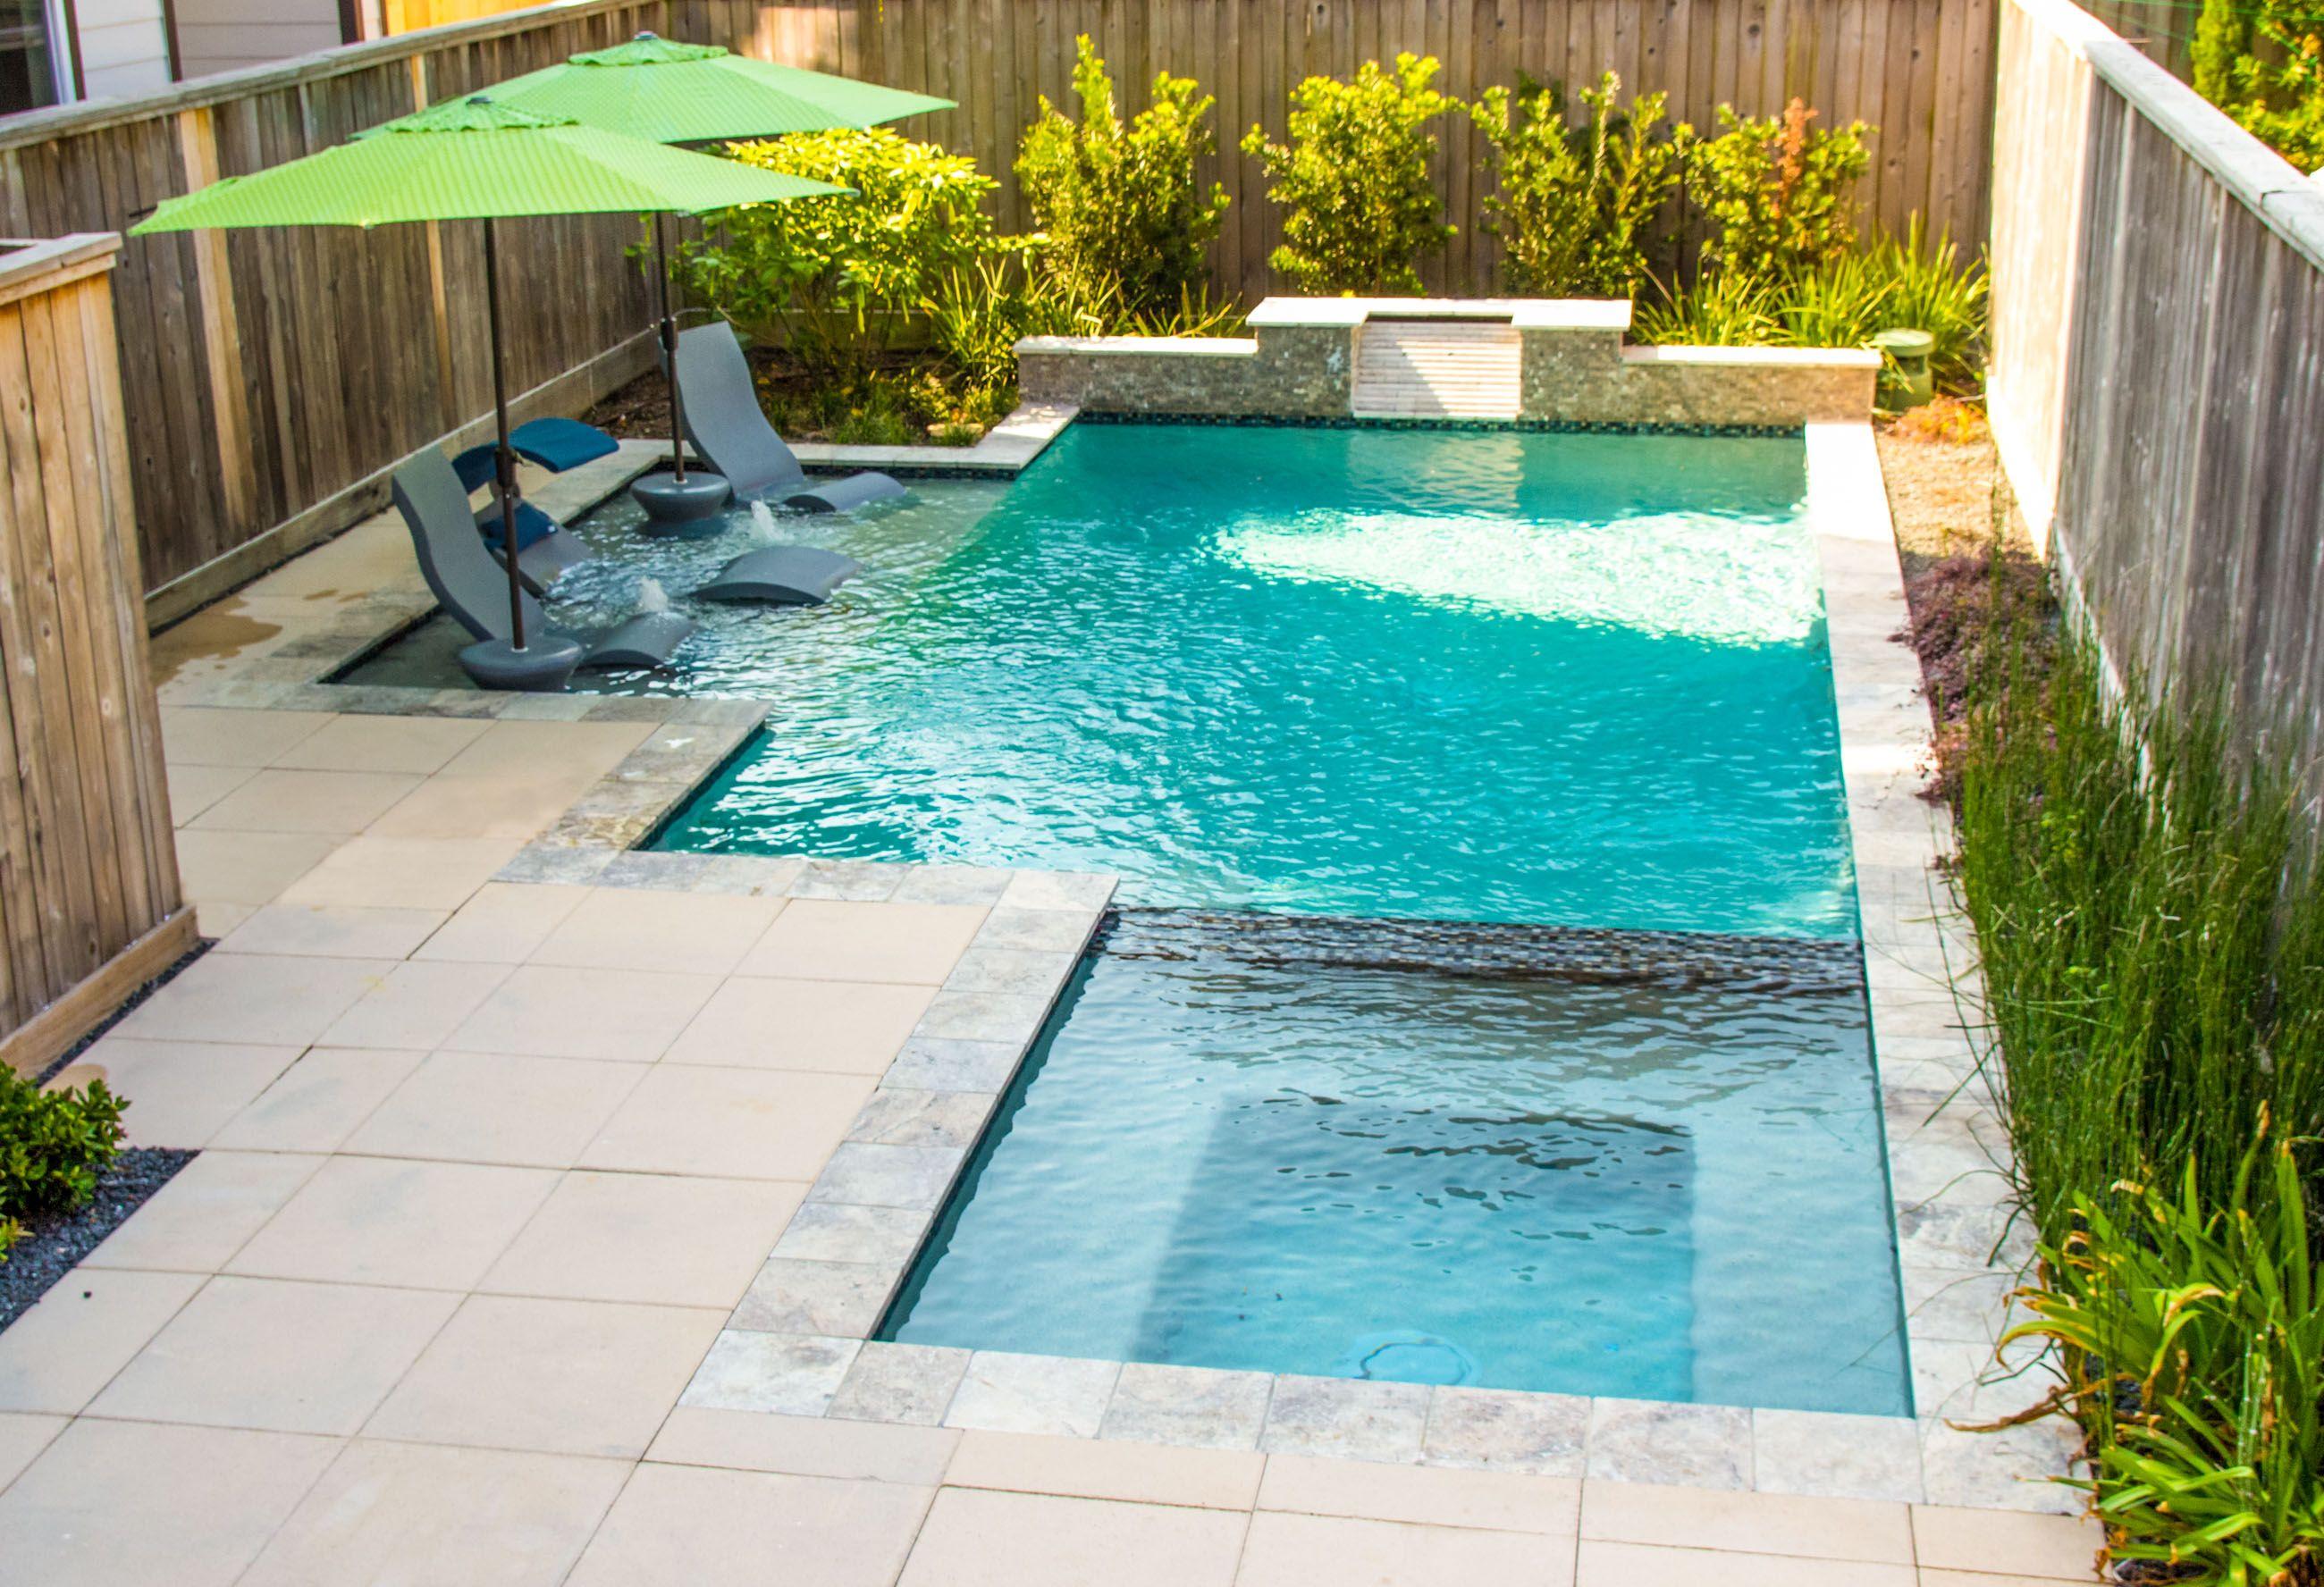 Custom Swimming Pools Priced Between $40k-$100k | Pools | Swimming ...